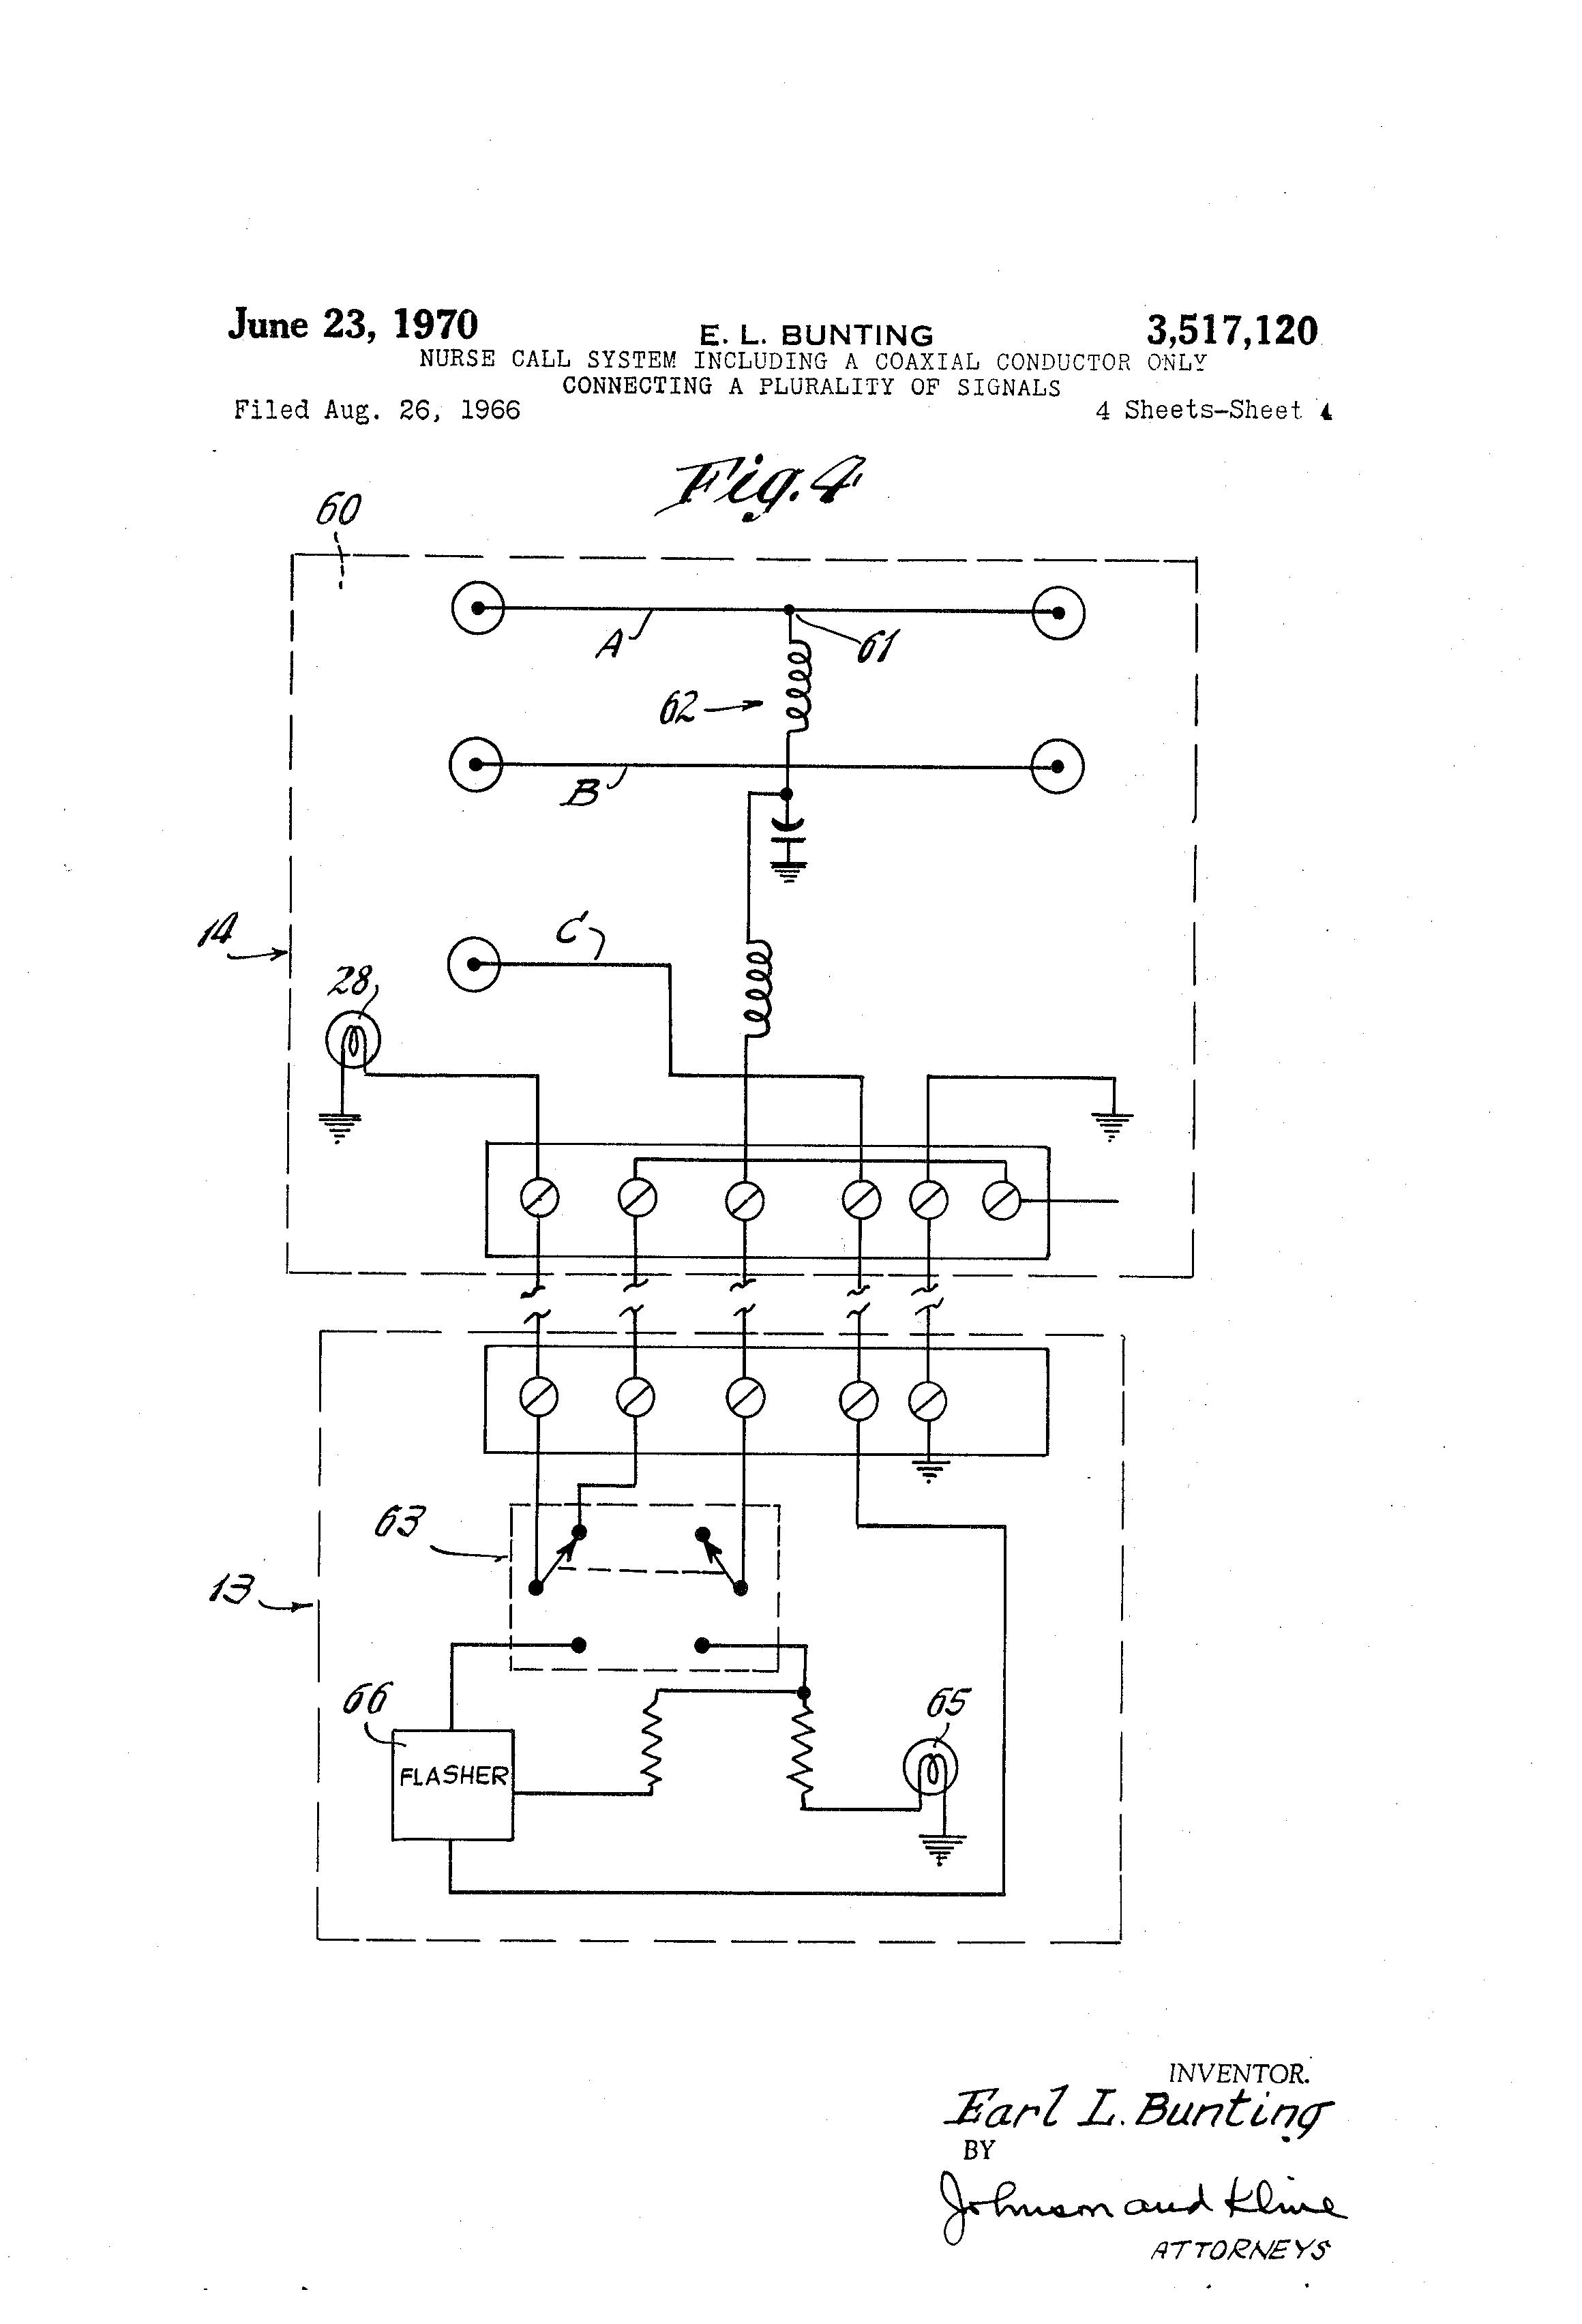 Dg6000 Wiring Diagram Detailed Schematics Northstar Generator Ford Diagrams